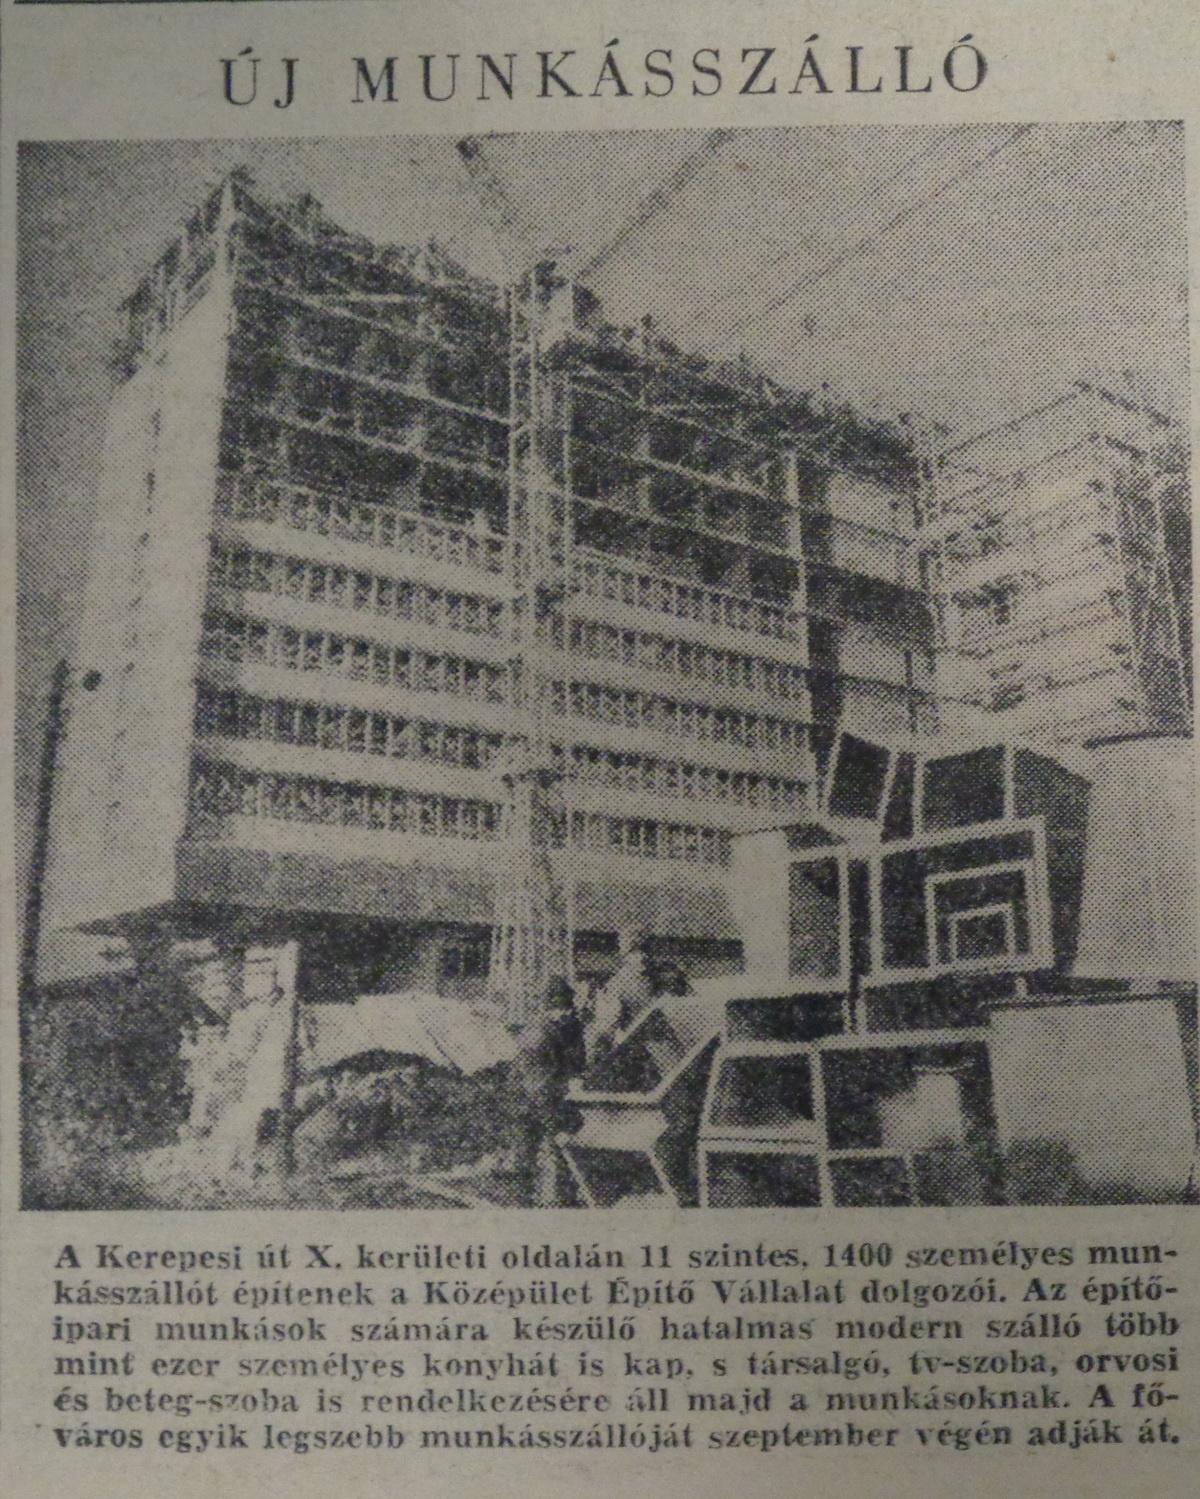 fovarosi.blog.hu: KerepesiUtiMunkasszallo-19680220-Nepszabadsag - indafoto.hu